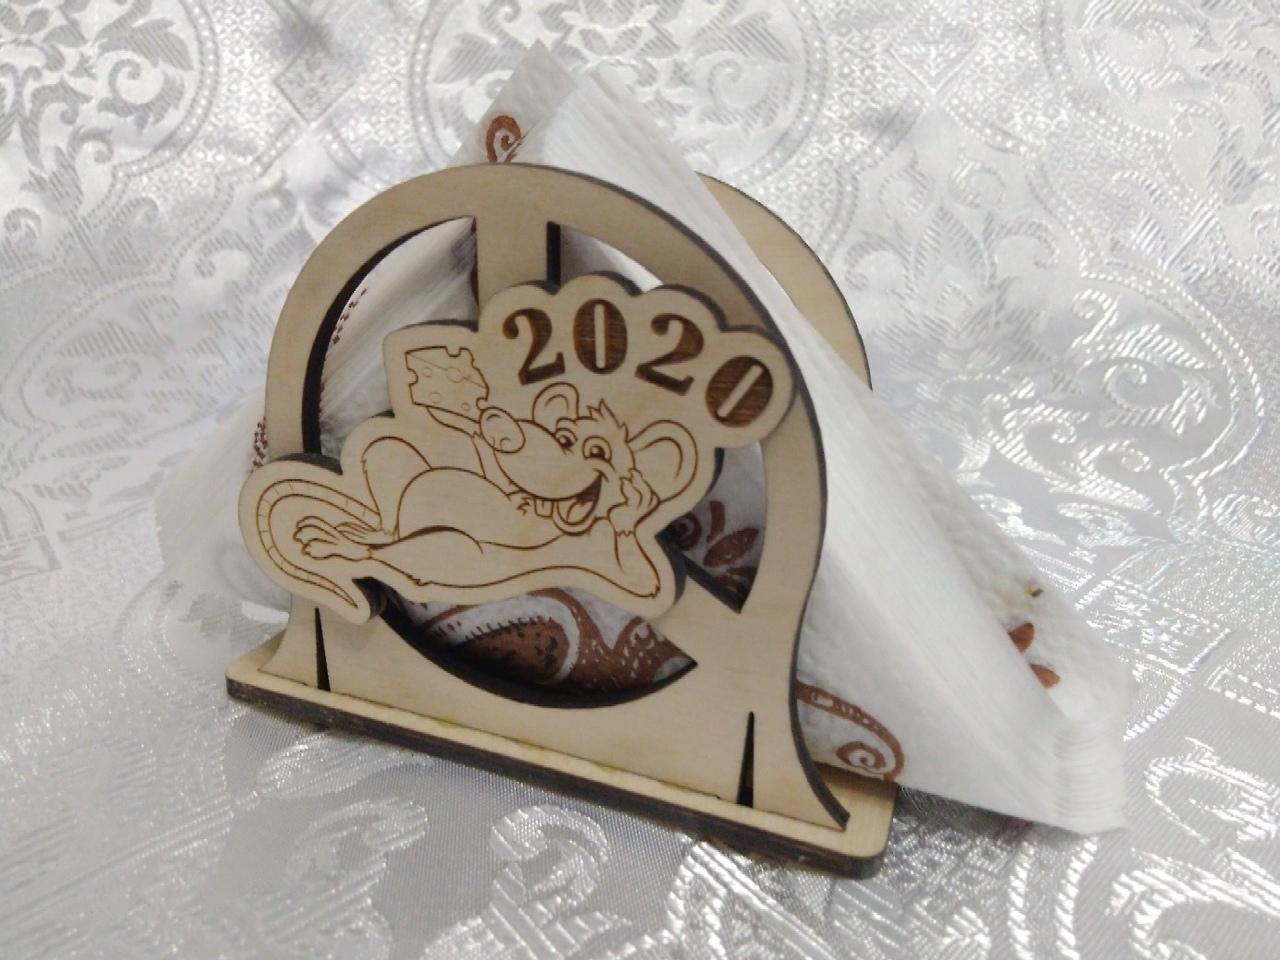 Laser Cut Standing Napkin Holder 2020 Free Vector